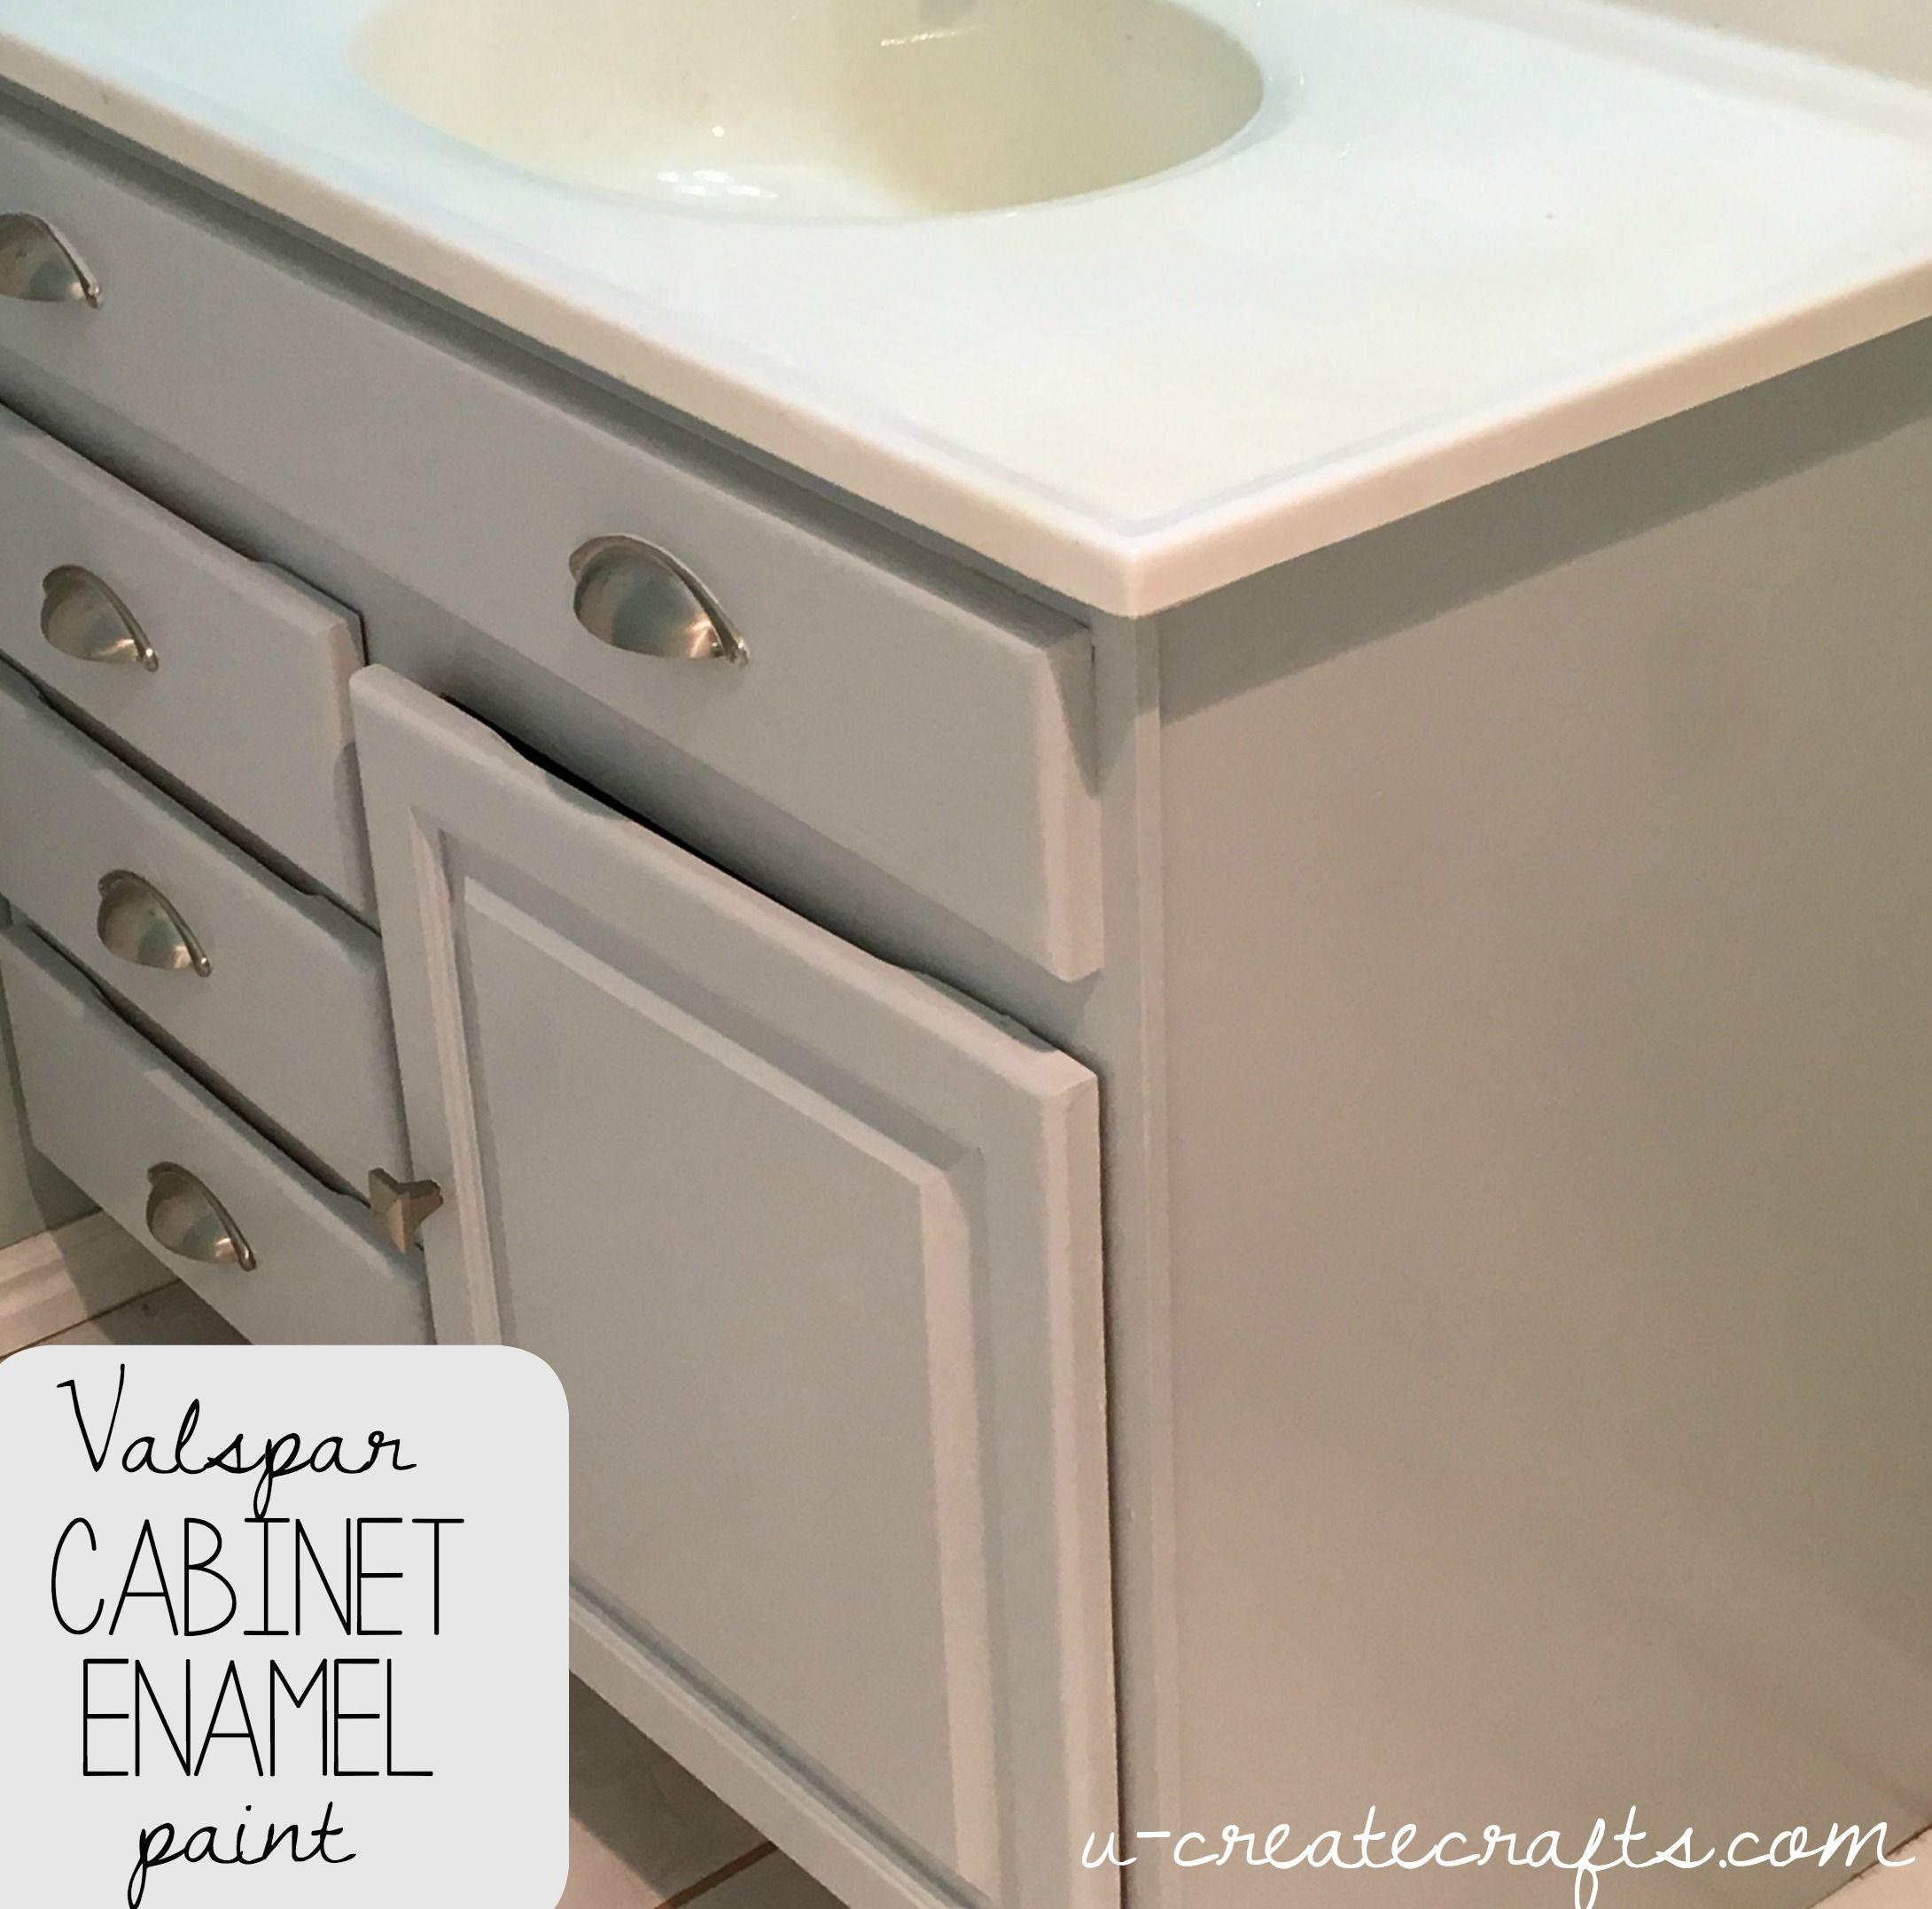 Valspar Cabinet Enamel Paint U Create Bathroom Cabinet Makeover Bathroom Cabinet Colors Valspar Cabinet Enamel